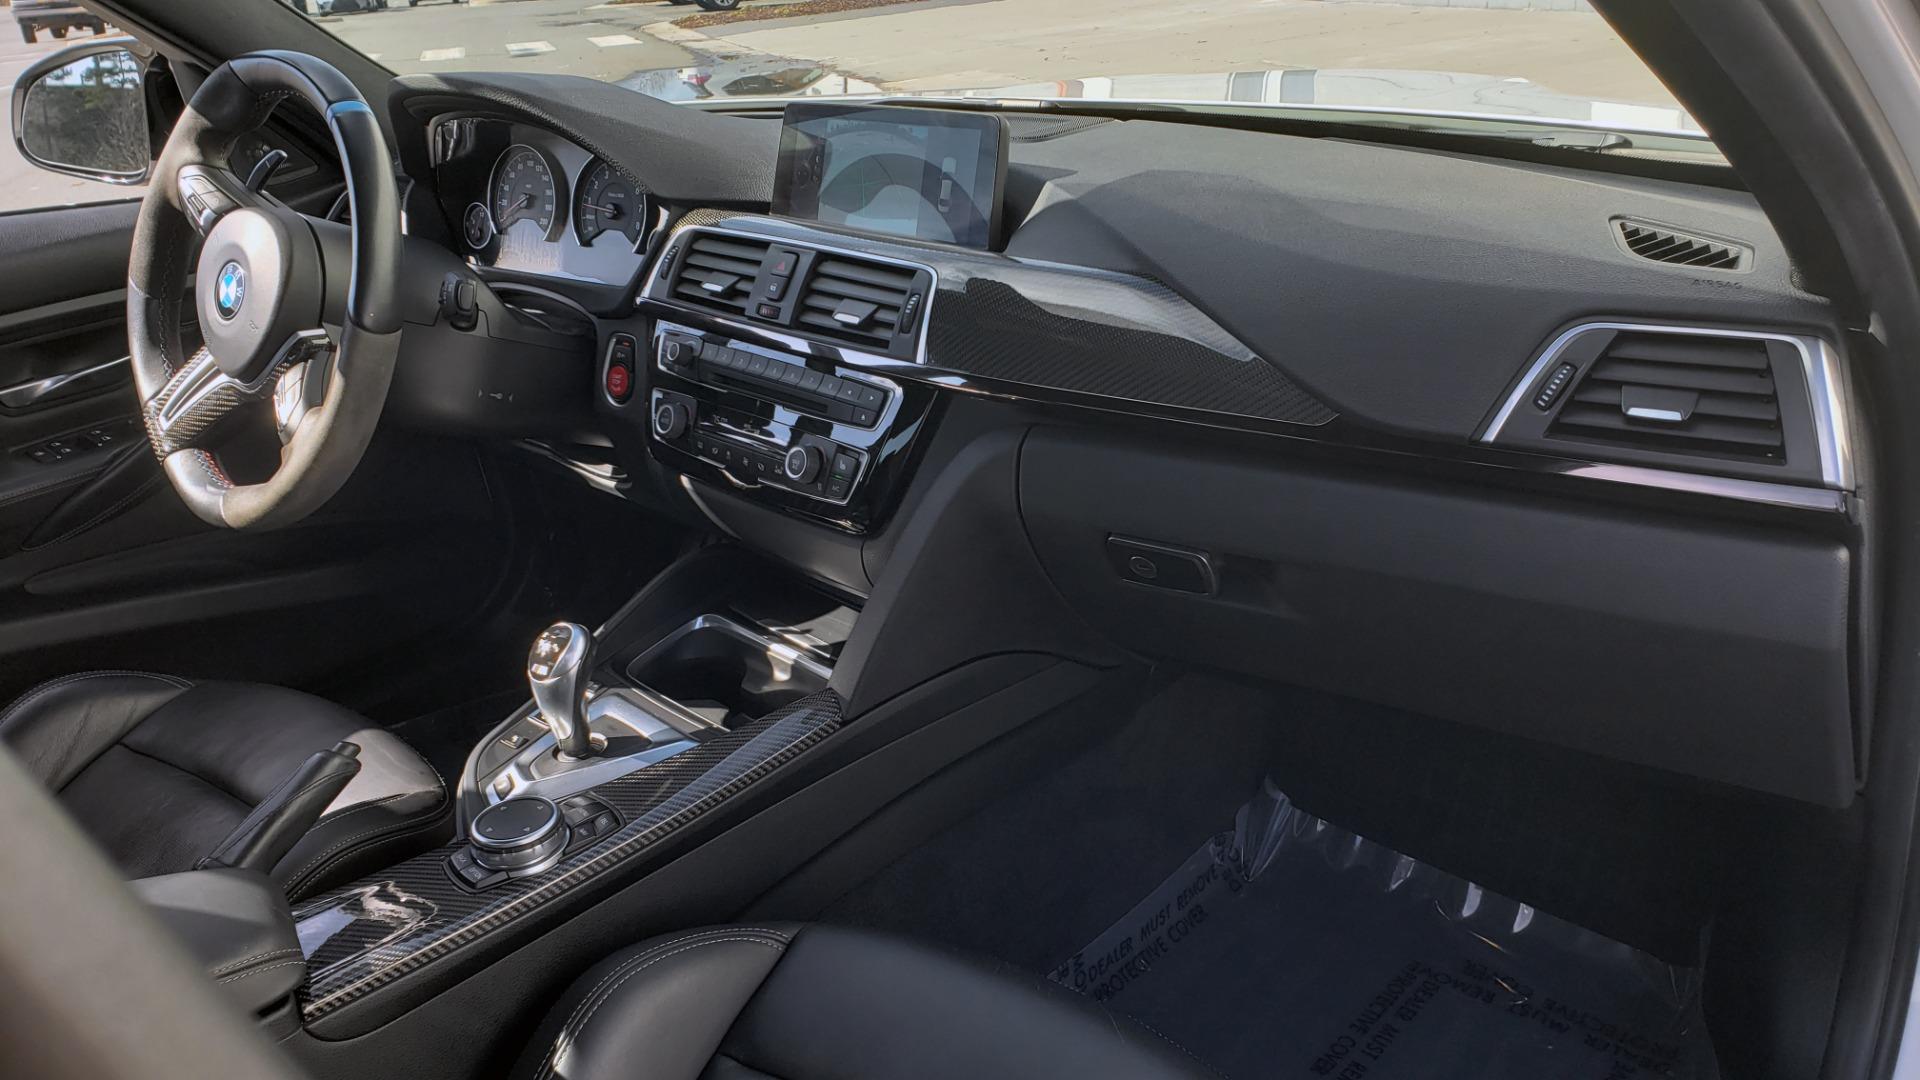 Used 2016 BMW M3 SEDAN / EXECUTIVE PKG / M-SUSPENSION / HARMAN/KARDON SOUND for sale Sold at Formula Imports in Charlotte NC 28227 70